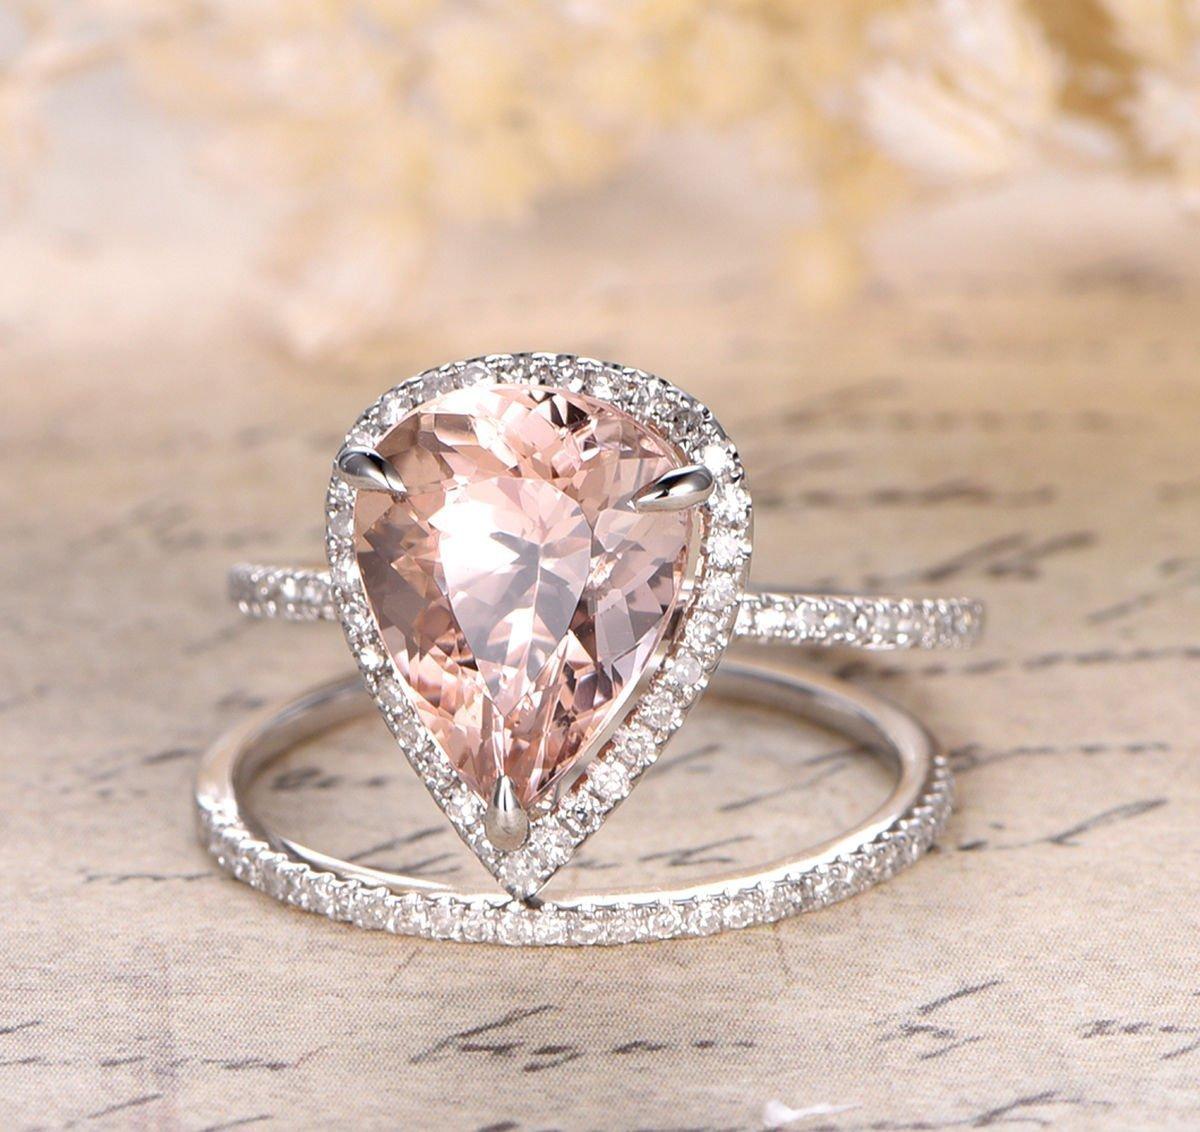 Pear Morganite Engagement Ring Bridal Set Pave Diamond Wedding 14K White Gold 10x12mm